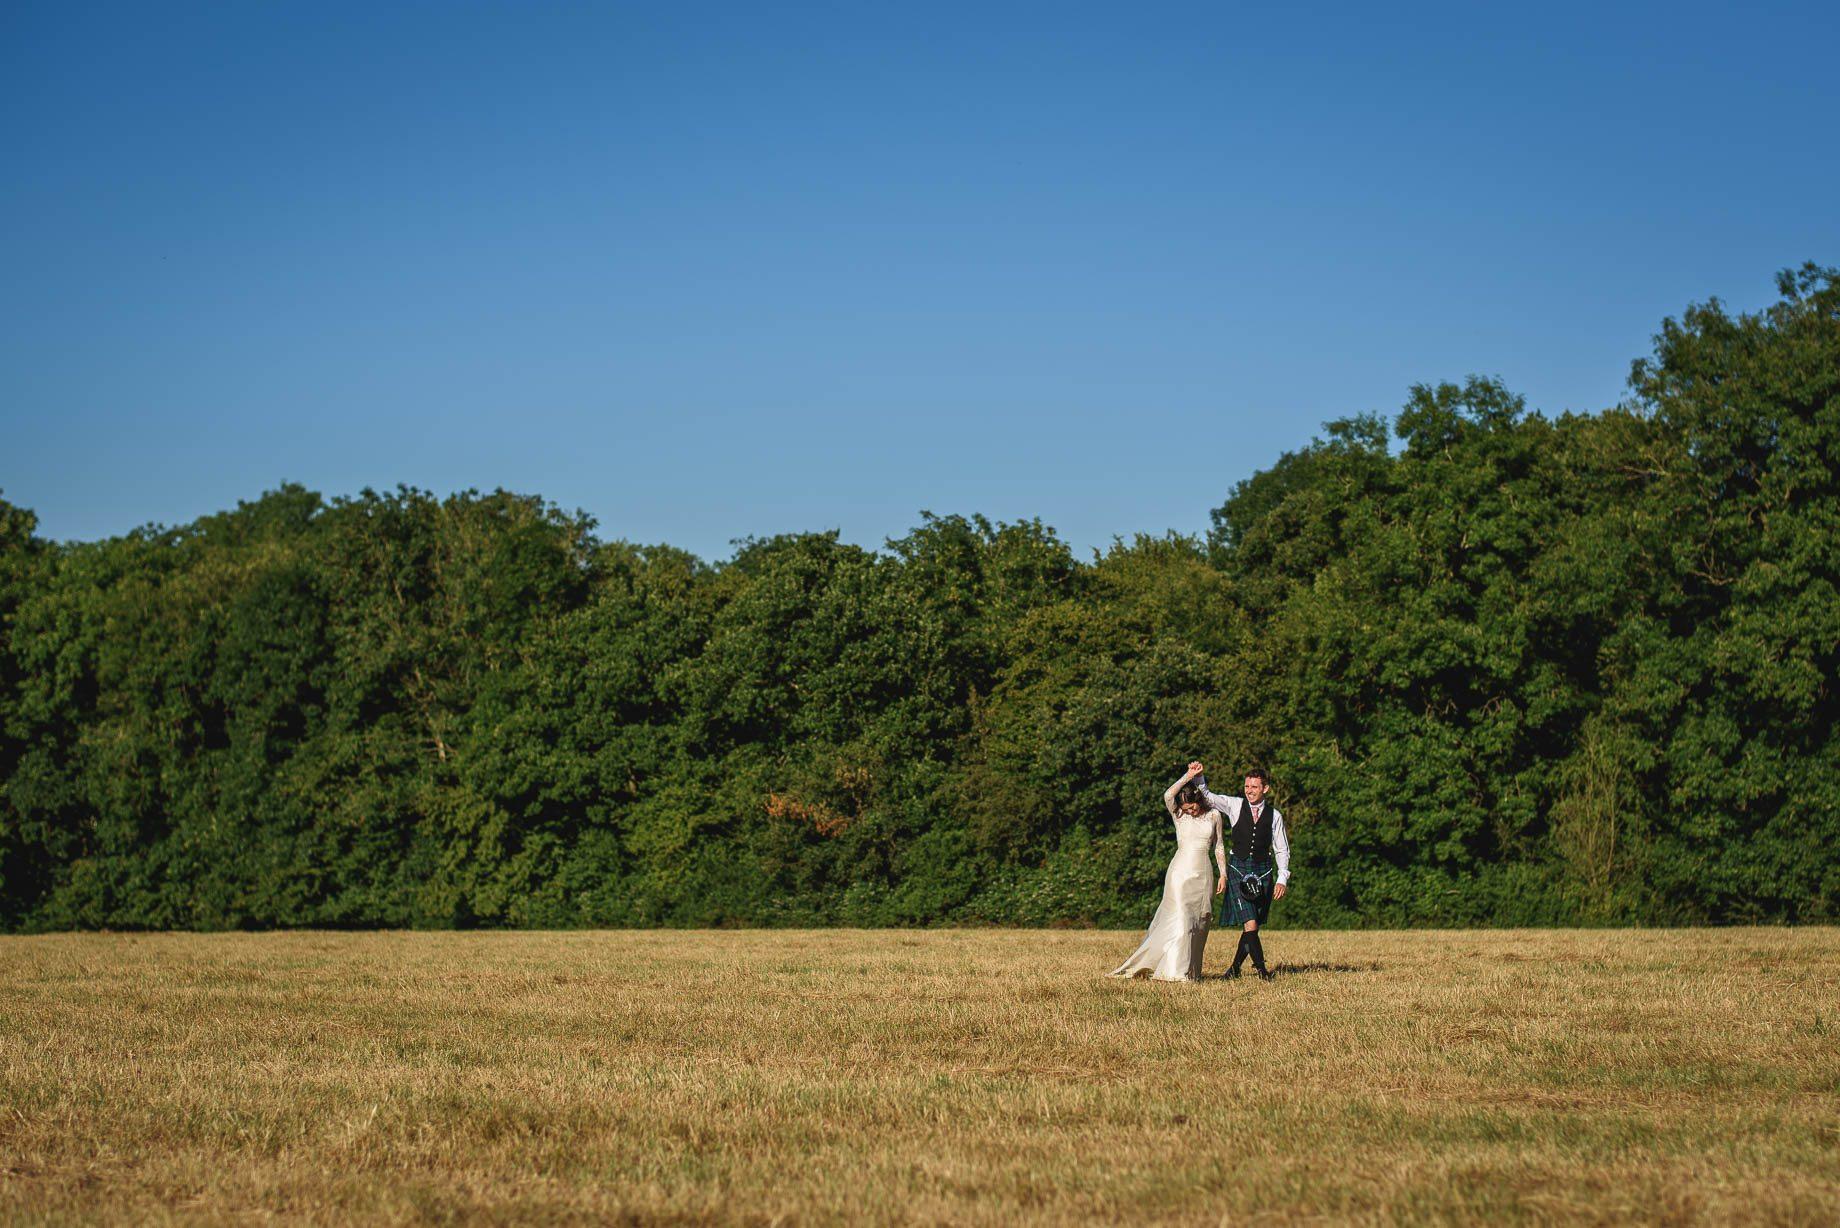 Gildings Barn wedding photography - Sarah and Steve (150 of 190)